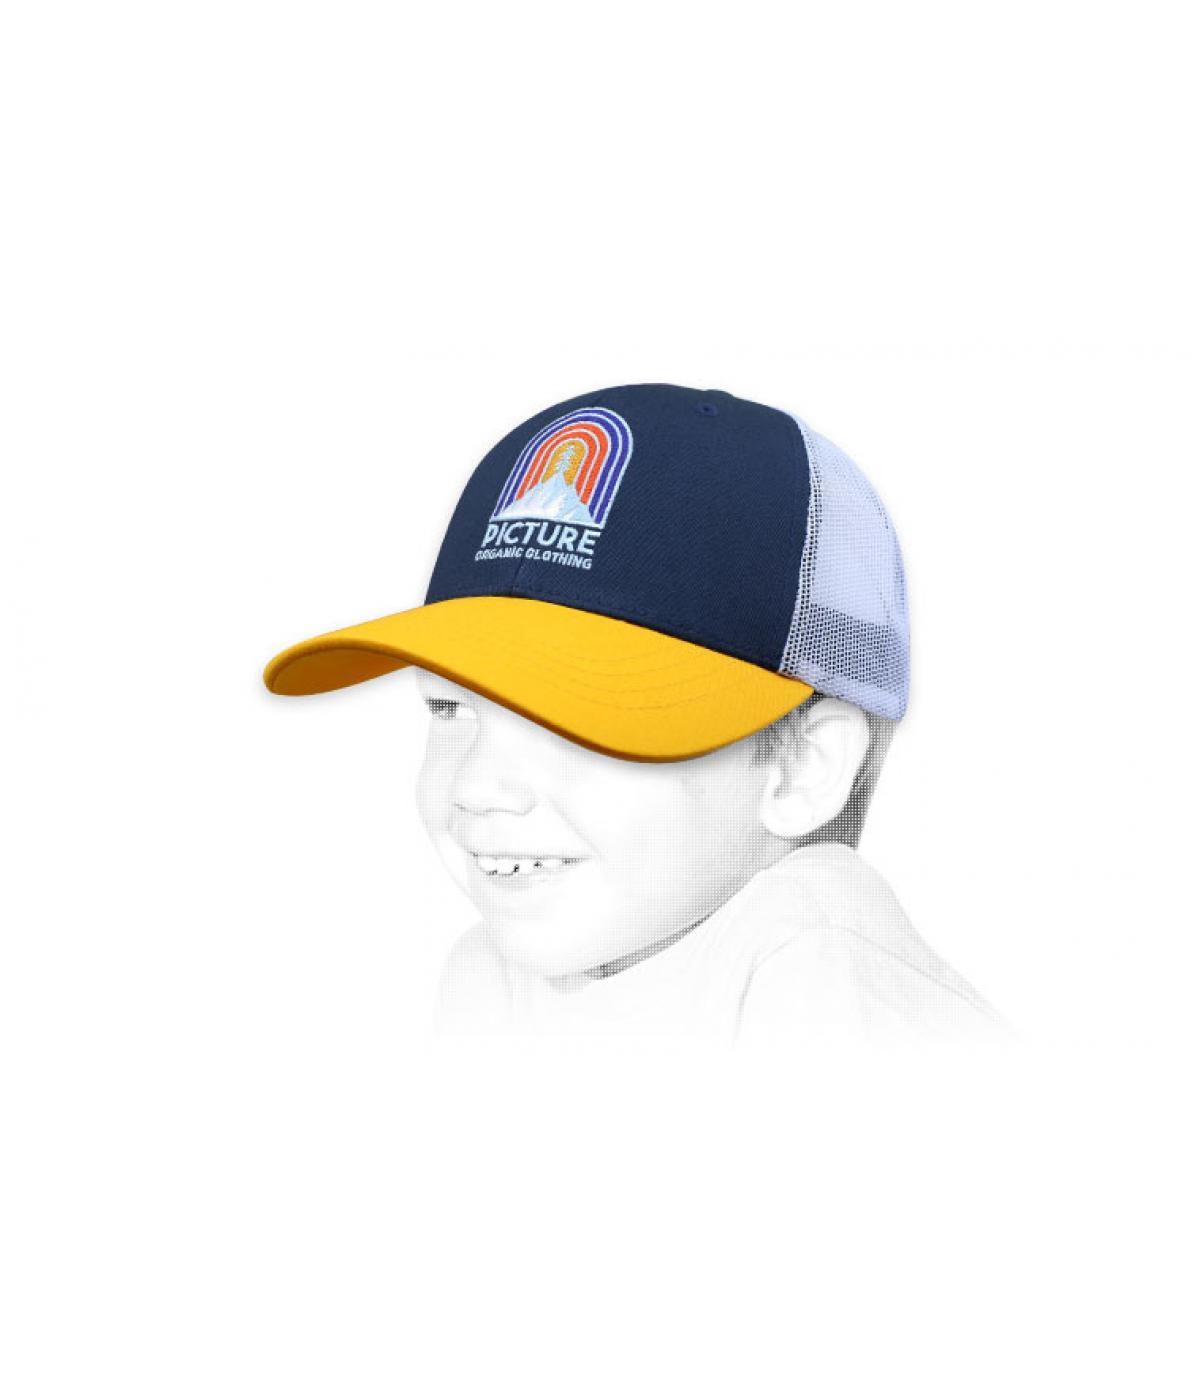 trucker enfant Picture jaune